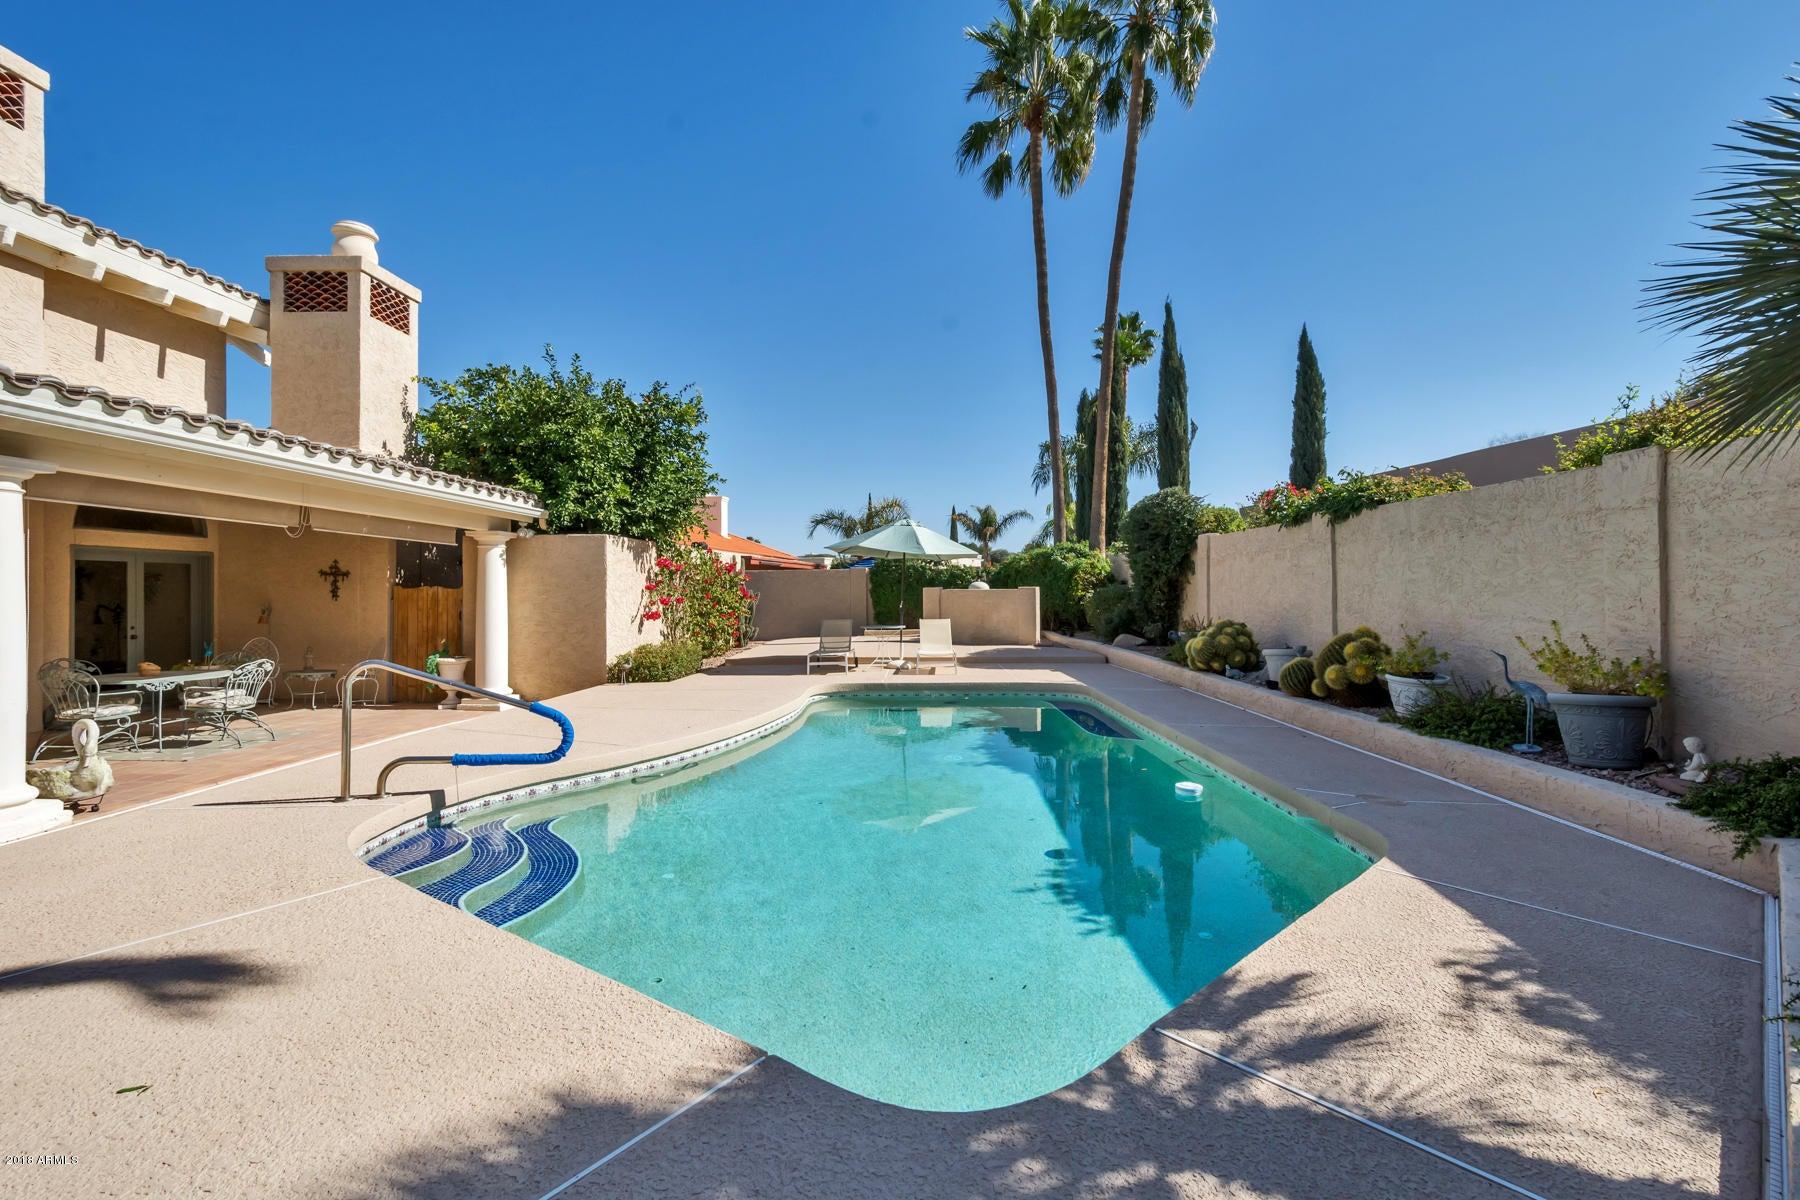 MLS 5720187 8205 E DEL CADENA Drive, Scottsdale, AZ 85258 Scottsdale AZ McCormick Ranch